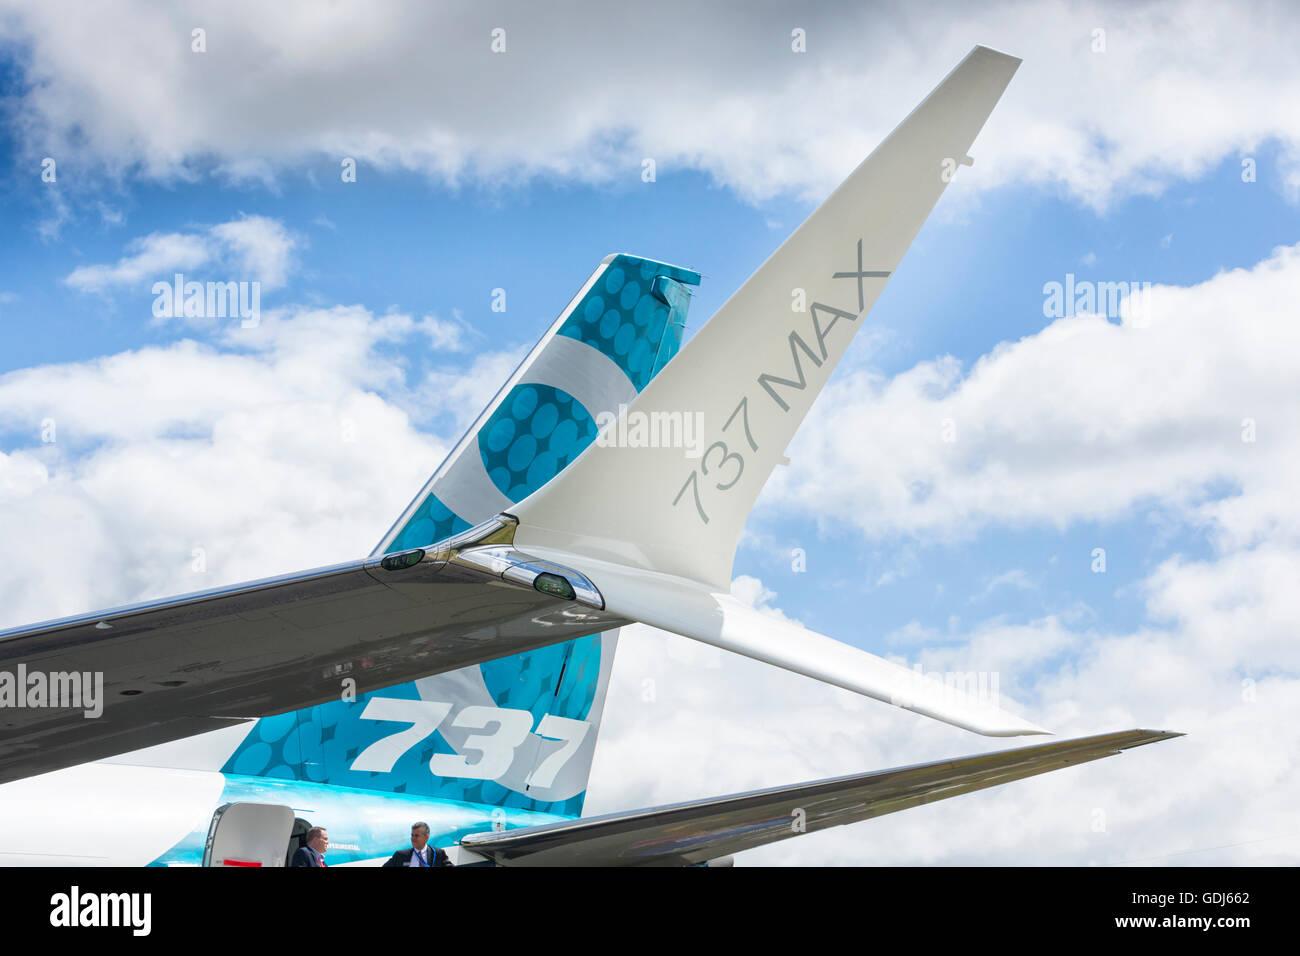 Boeing 737 MAX split tip winglet. Farnbourgh 2016 - Stock Image